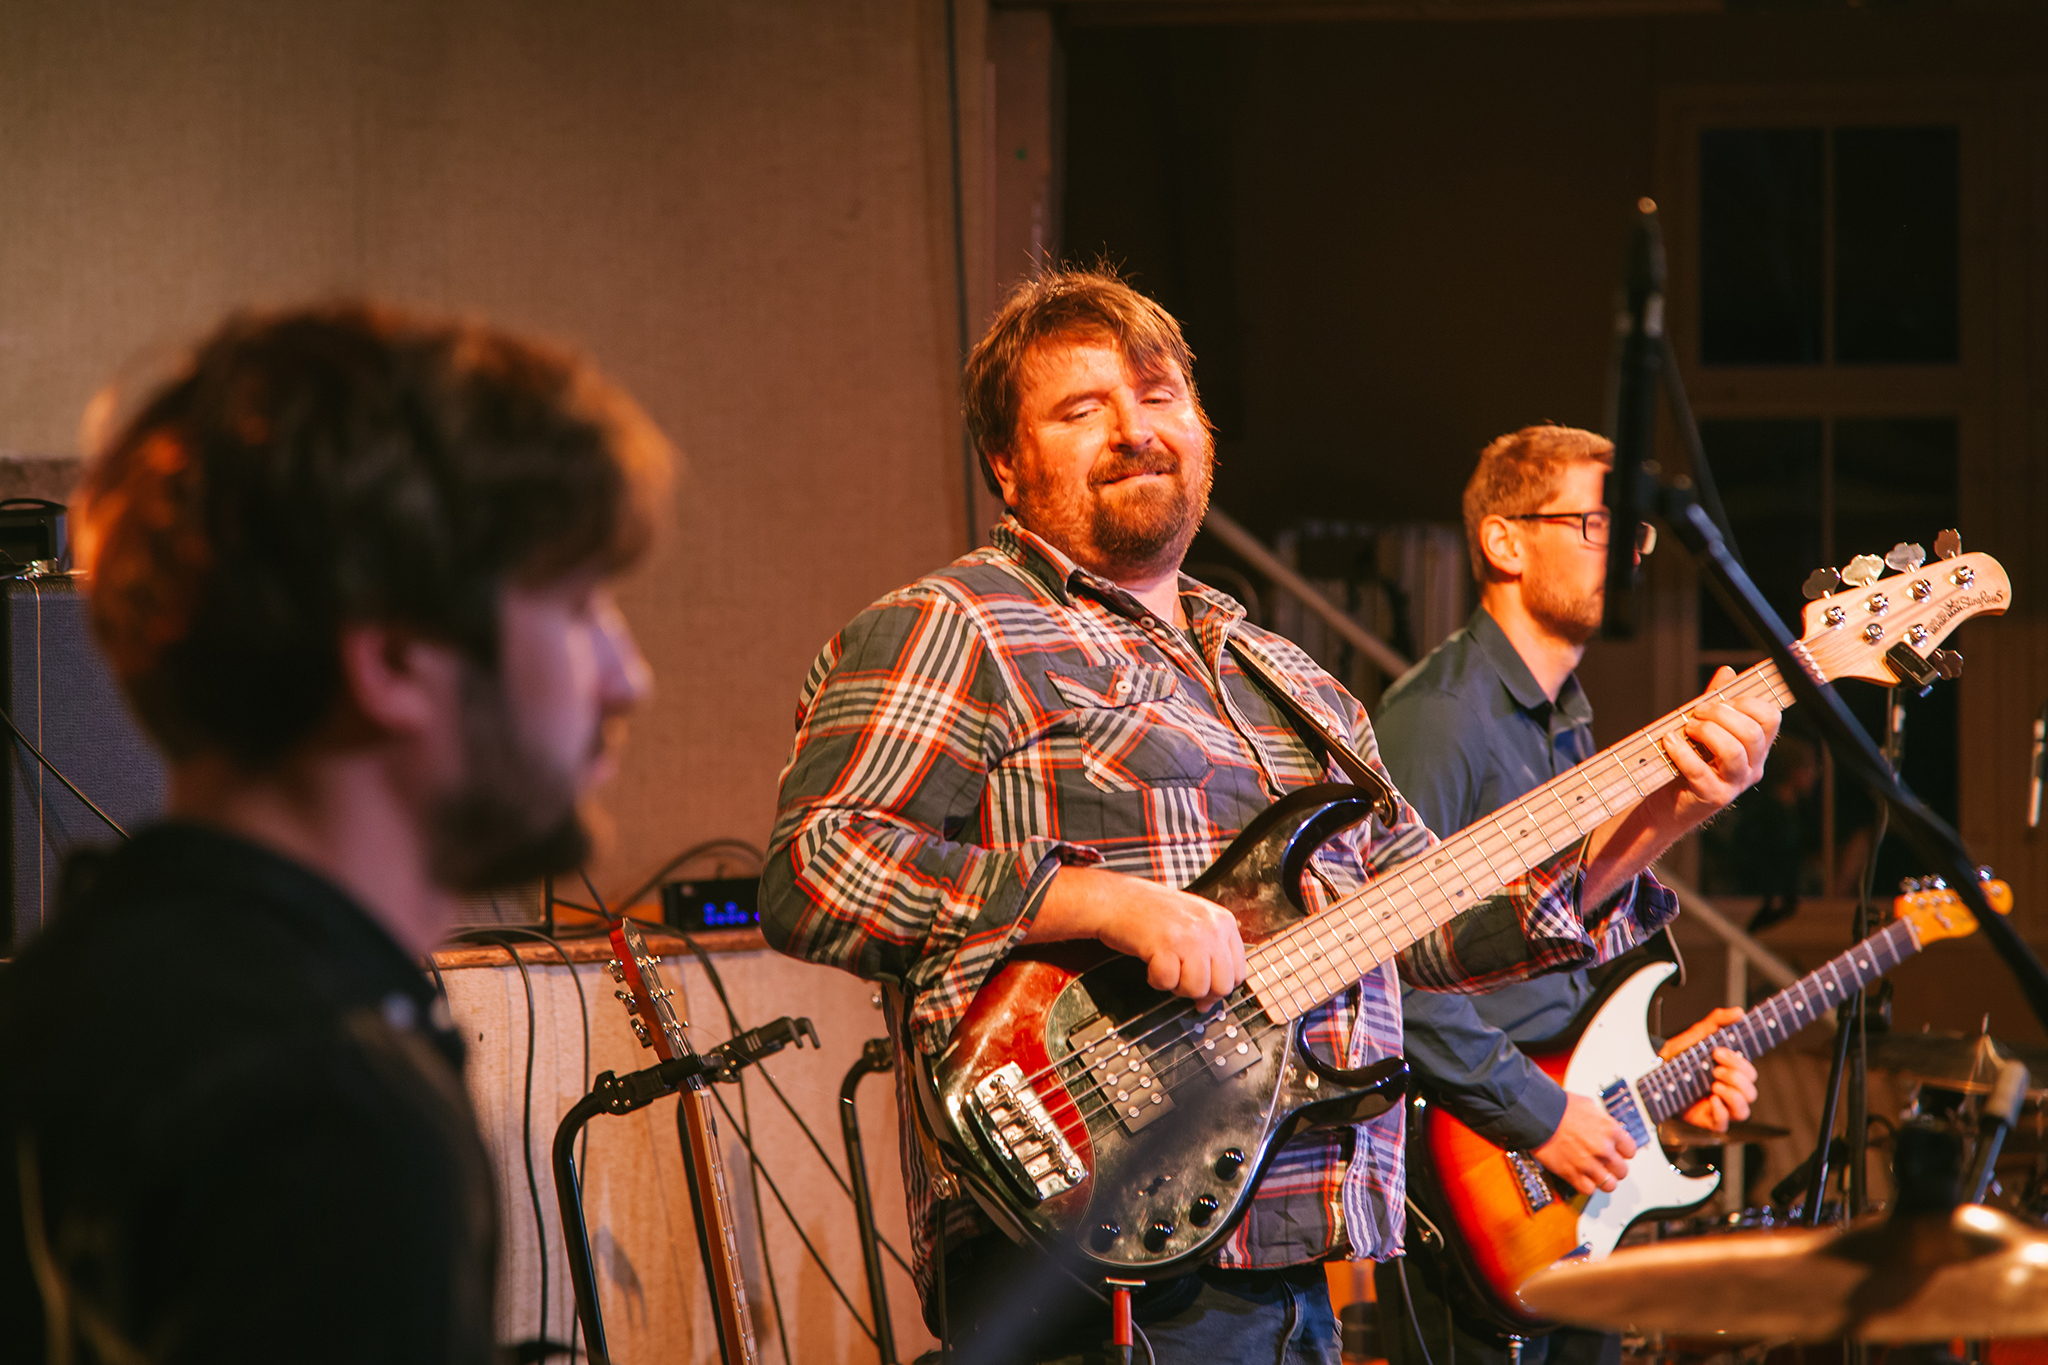 Eben-Ezer-Sessions am 18.10.2019: Der Bass sorgt für den Beat. (Foto: Knut Burmeister, ALLTAG)